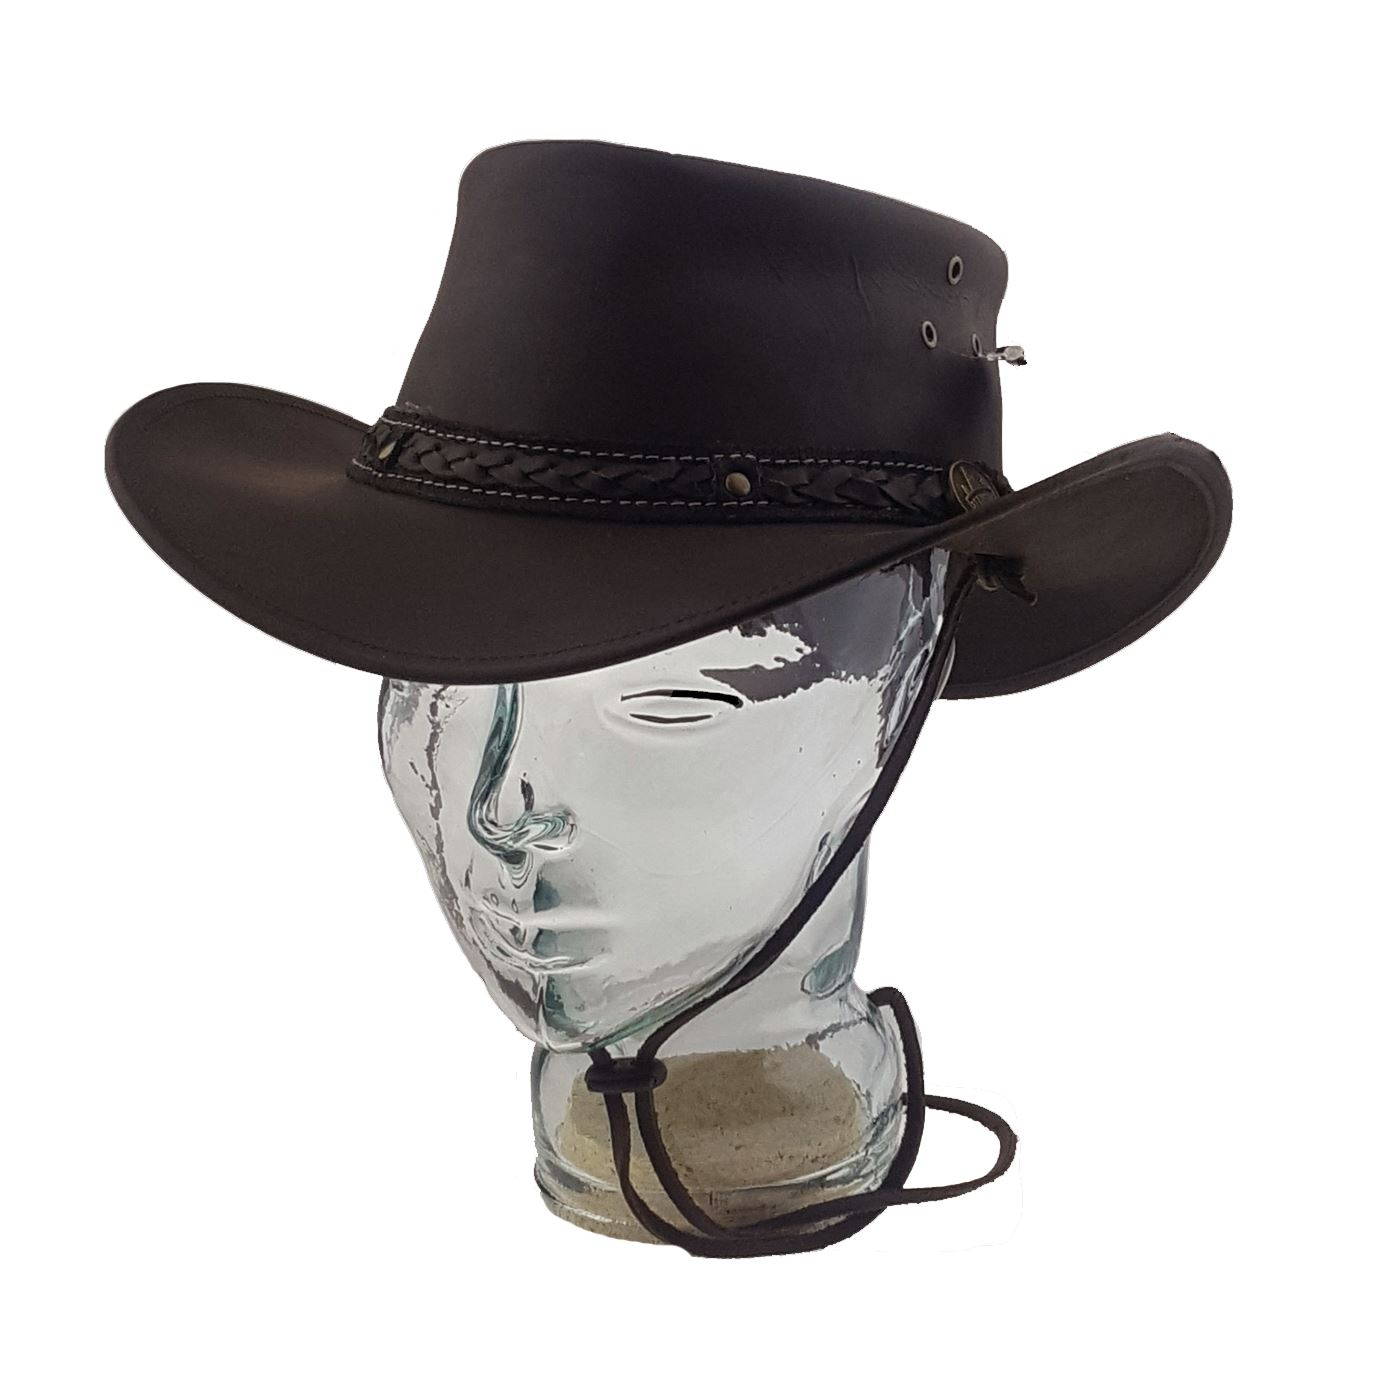 LEATHER COWBOY WESTERN AUSSIE STYLE  BUSH HAT BROWN WATERPROOF PULUP